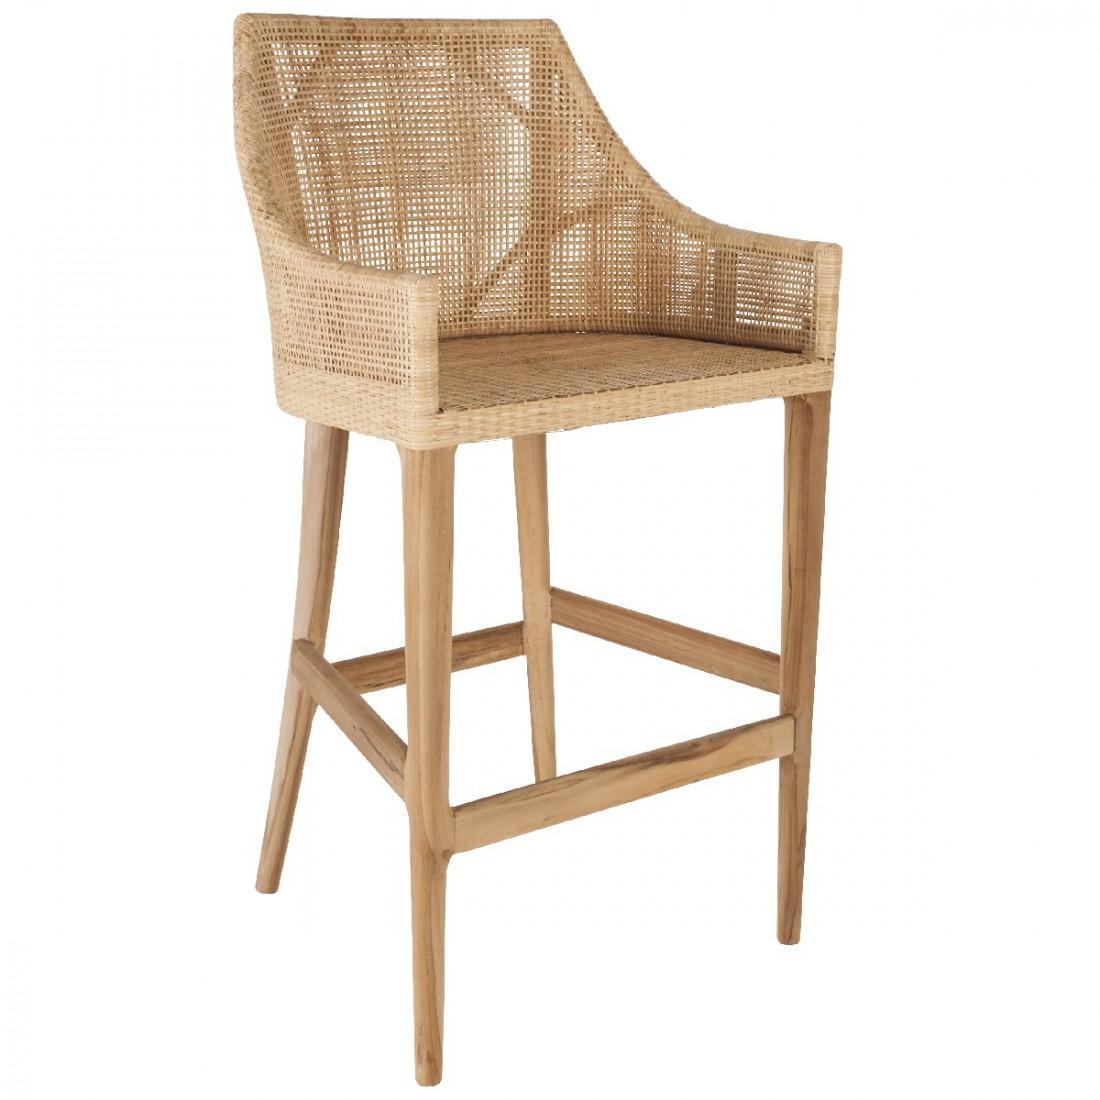 Wooden Teak and Rattan Bar Stool